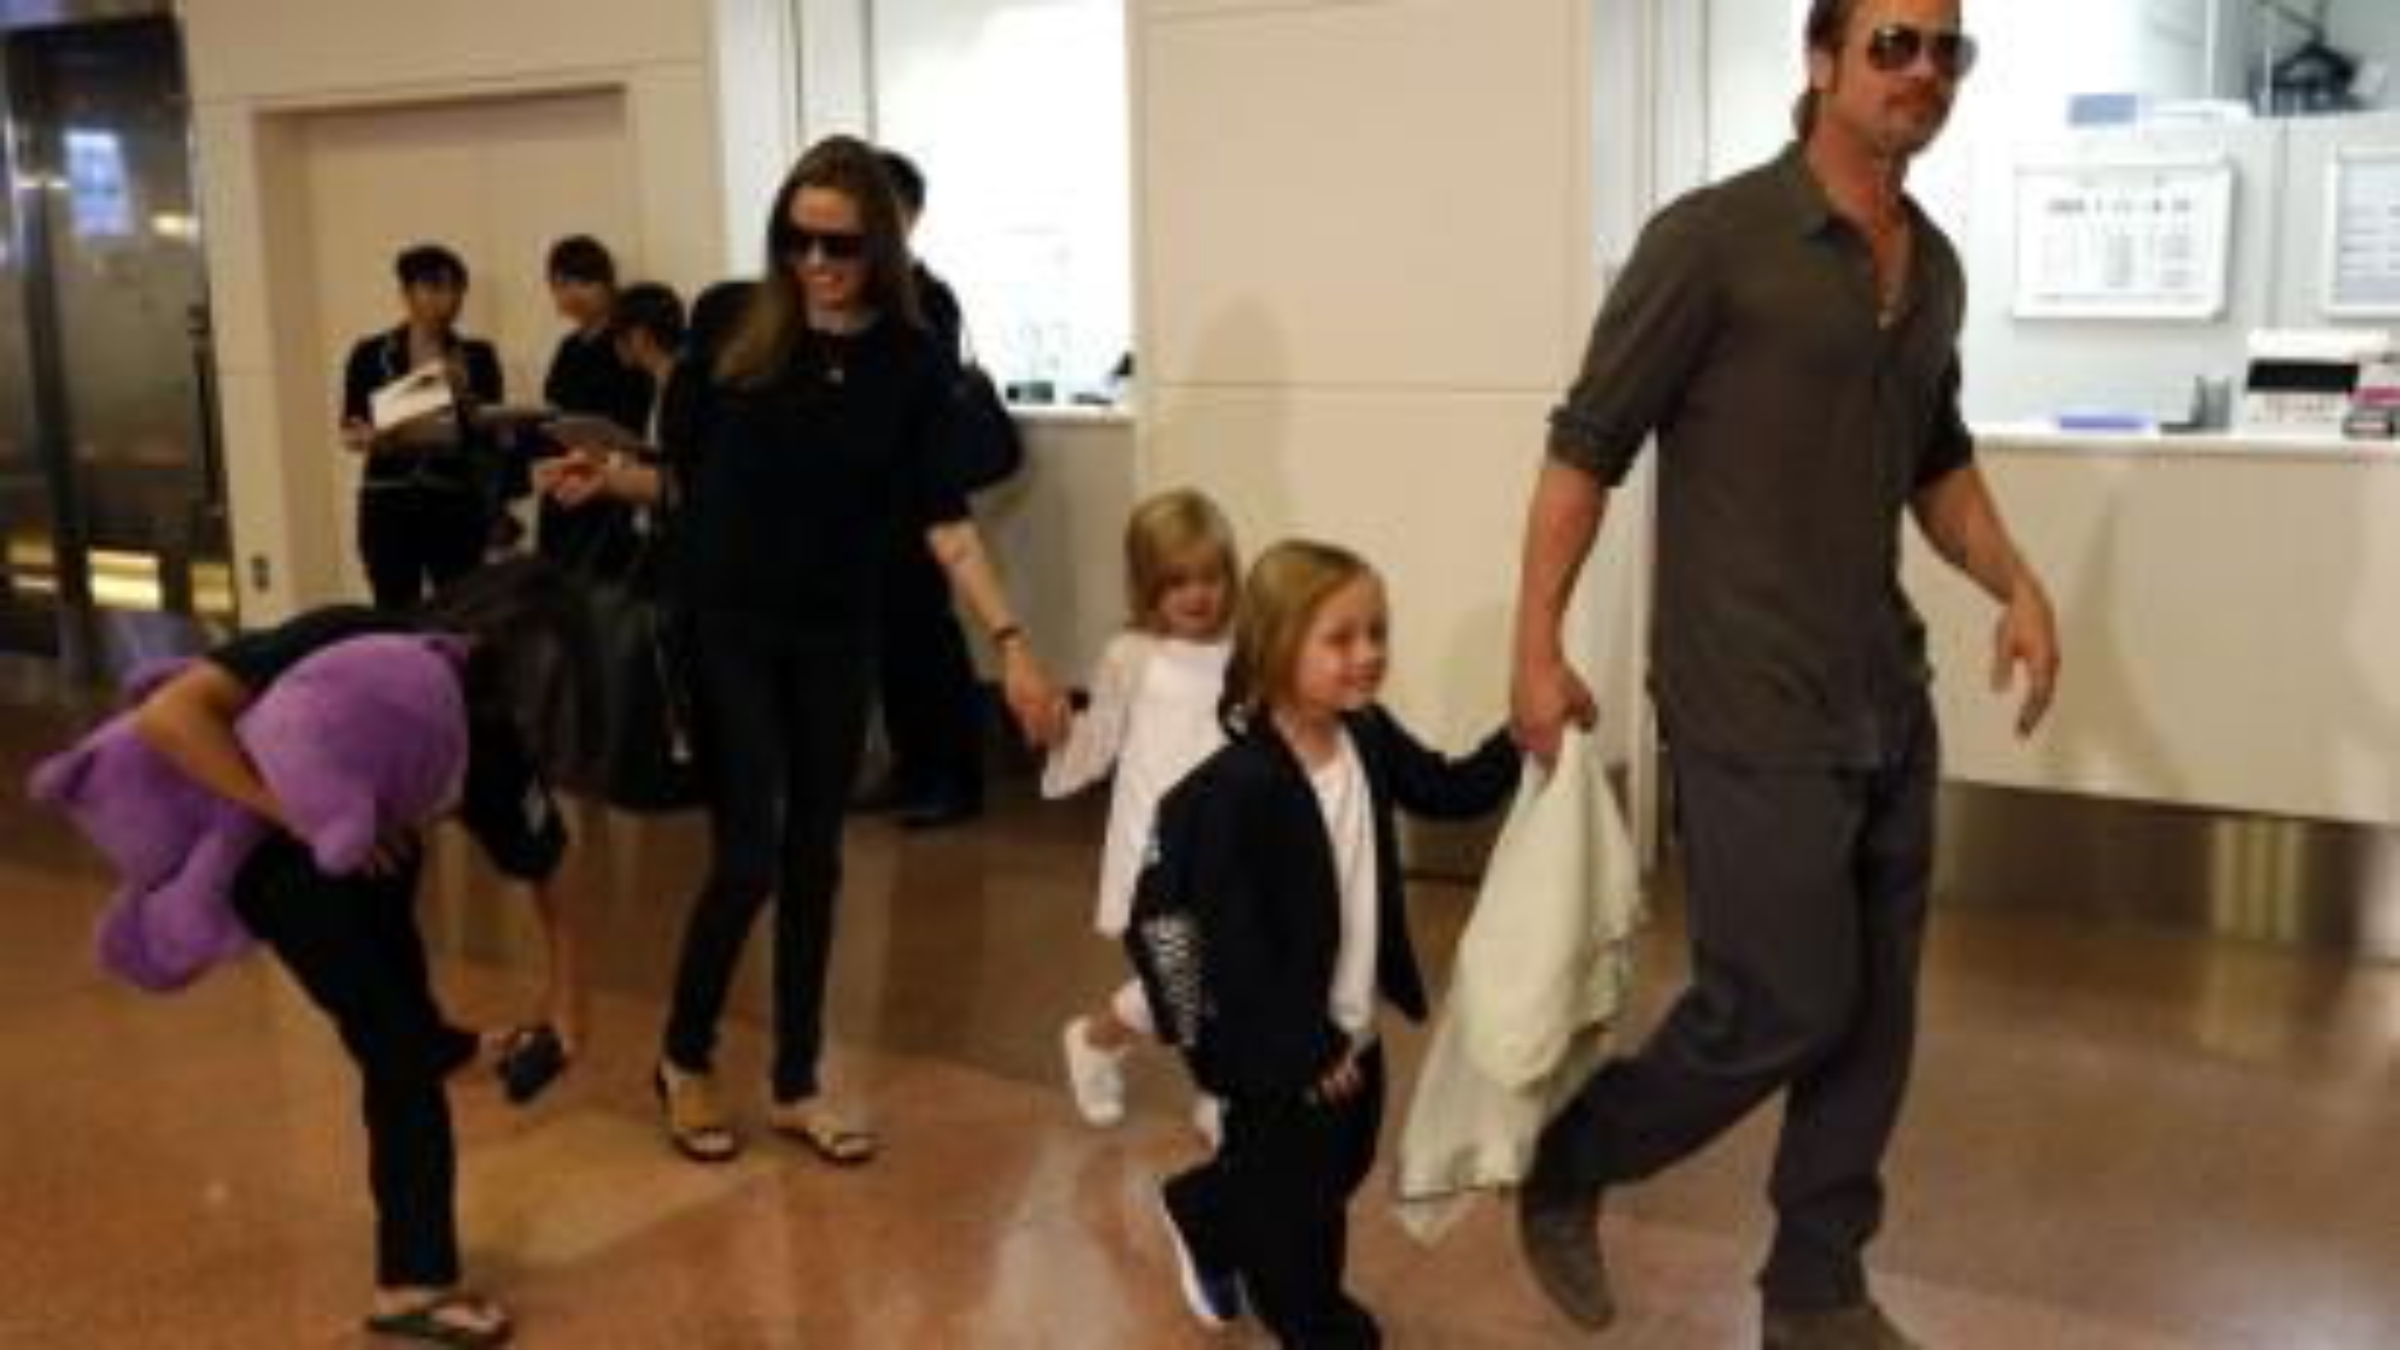 Angelina Jolie Brad Pitt and their children